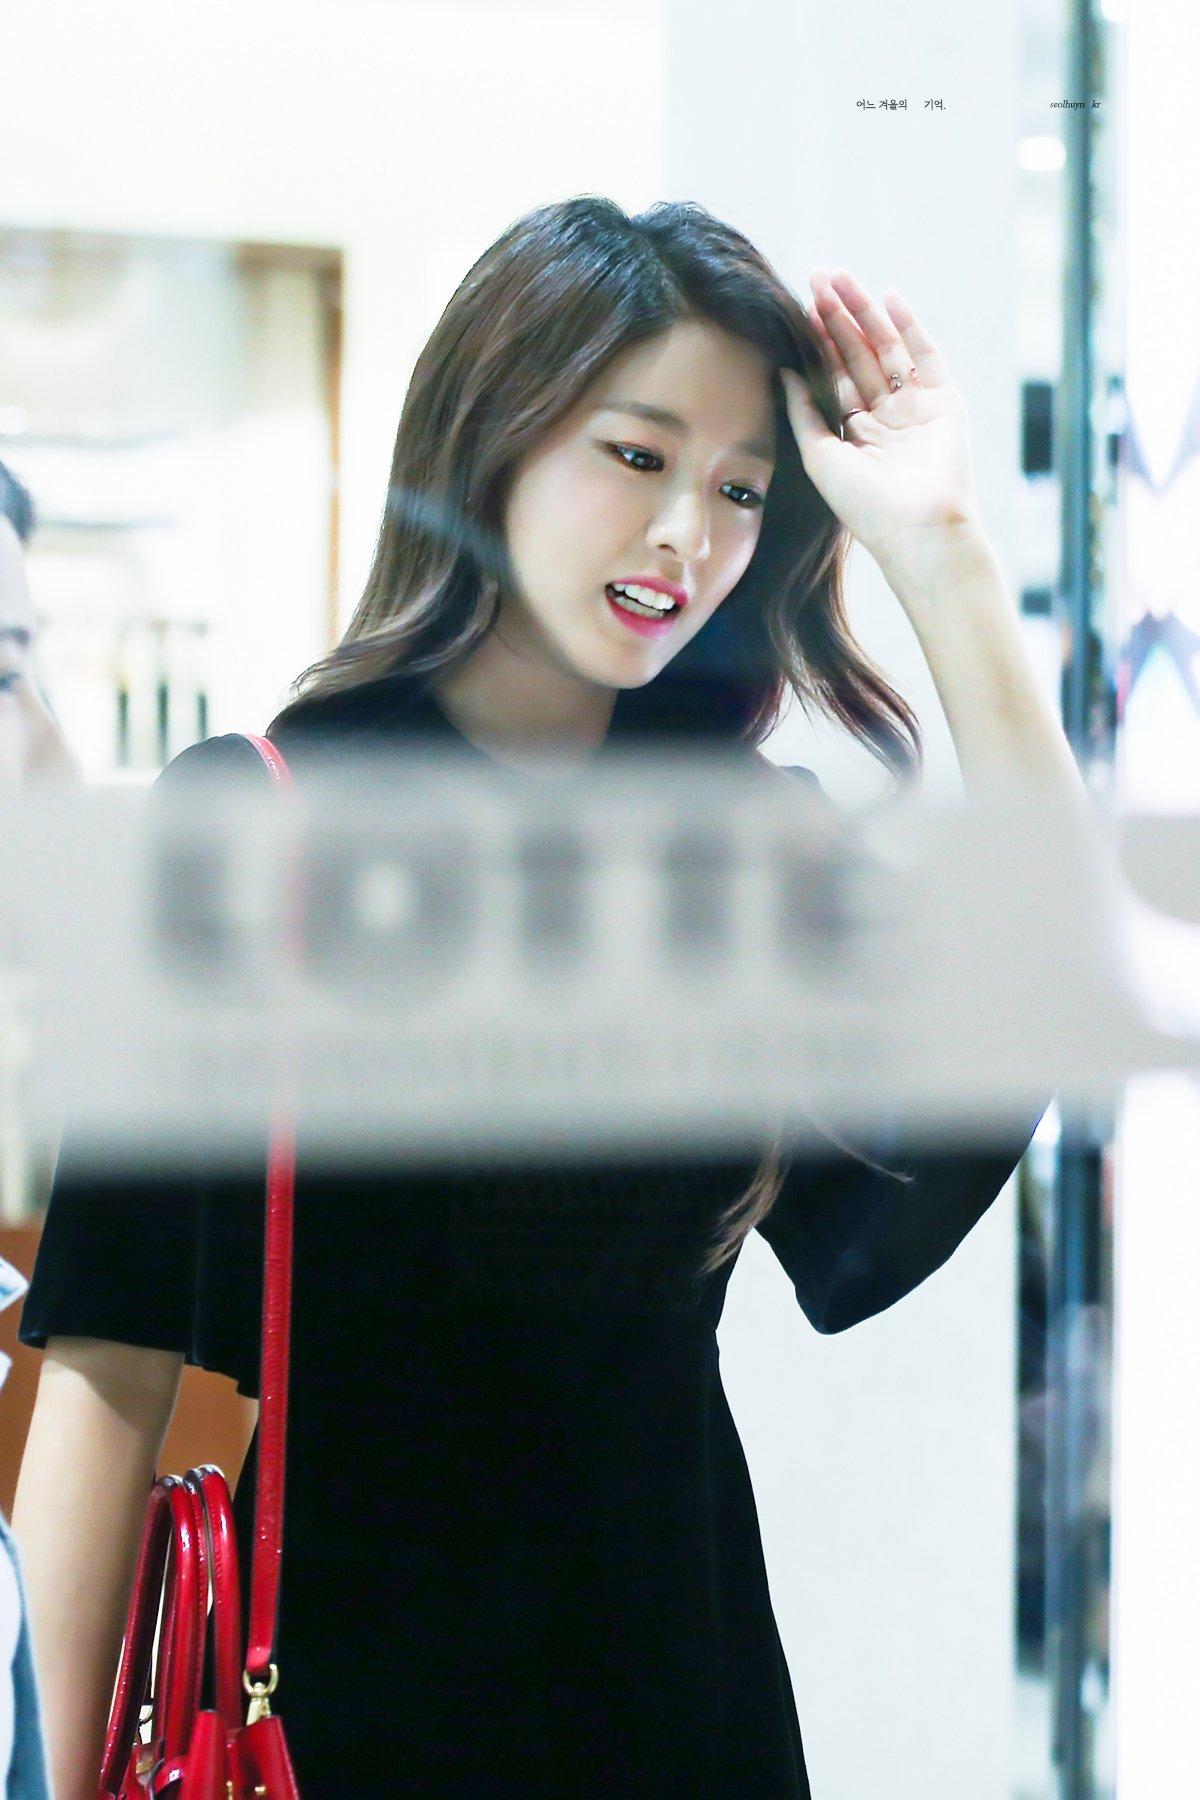 161014 HAZZYS 팬싸인회 설현